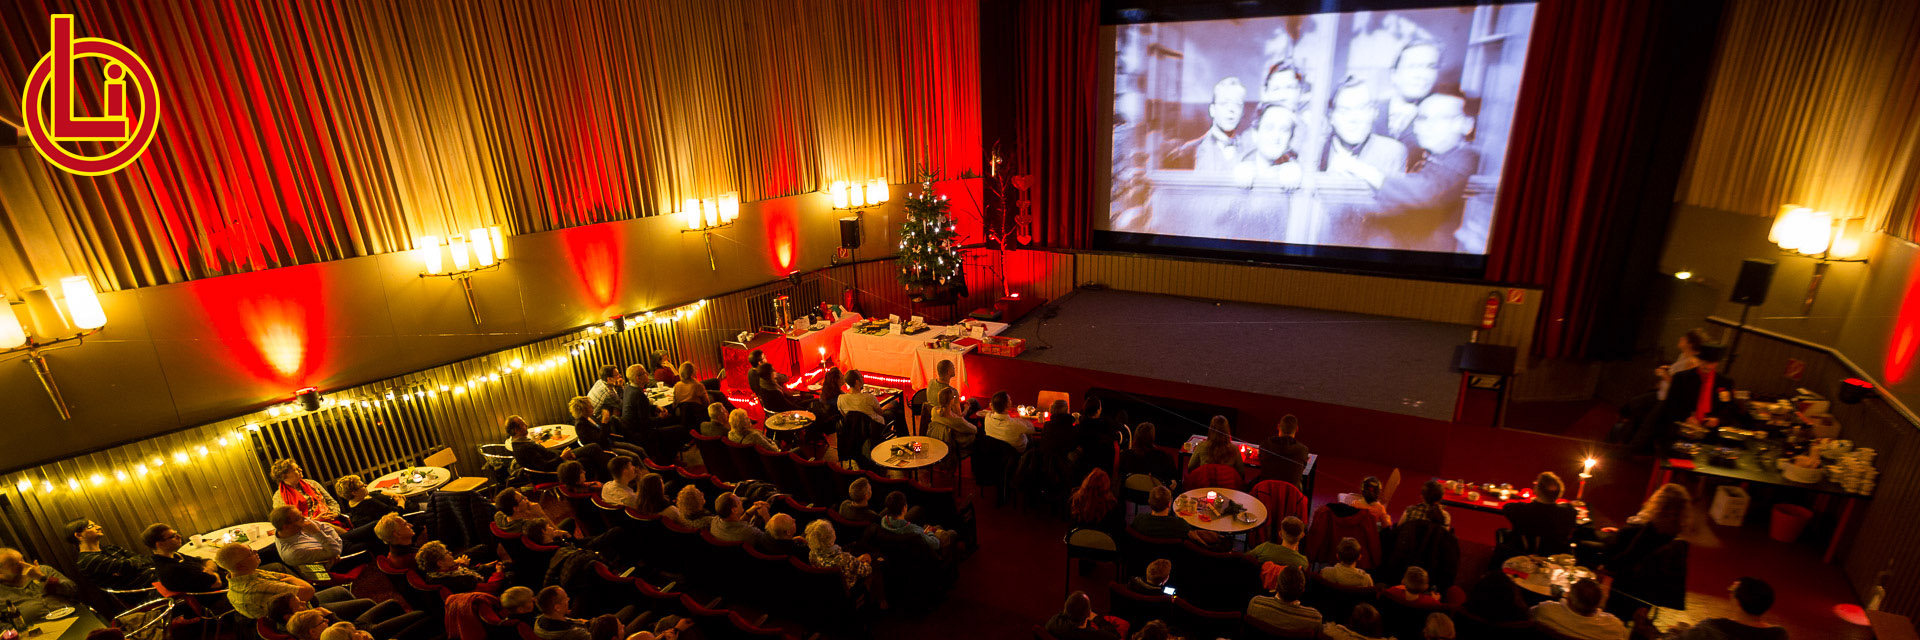 OLi-Kino Magdeburg